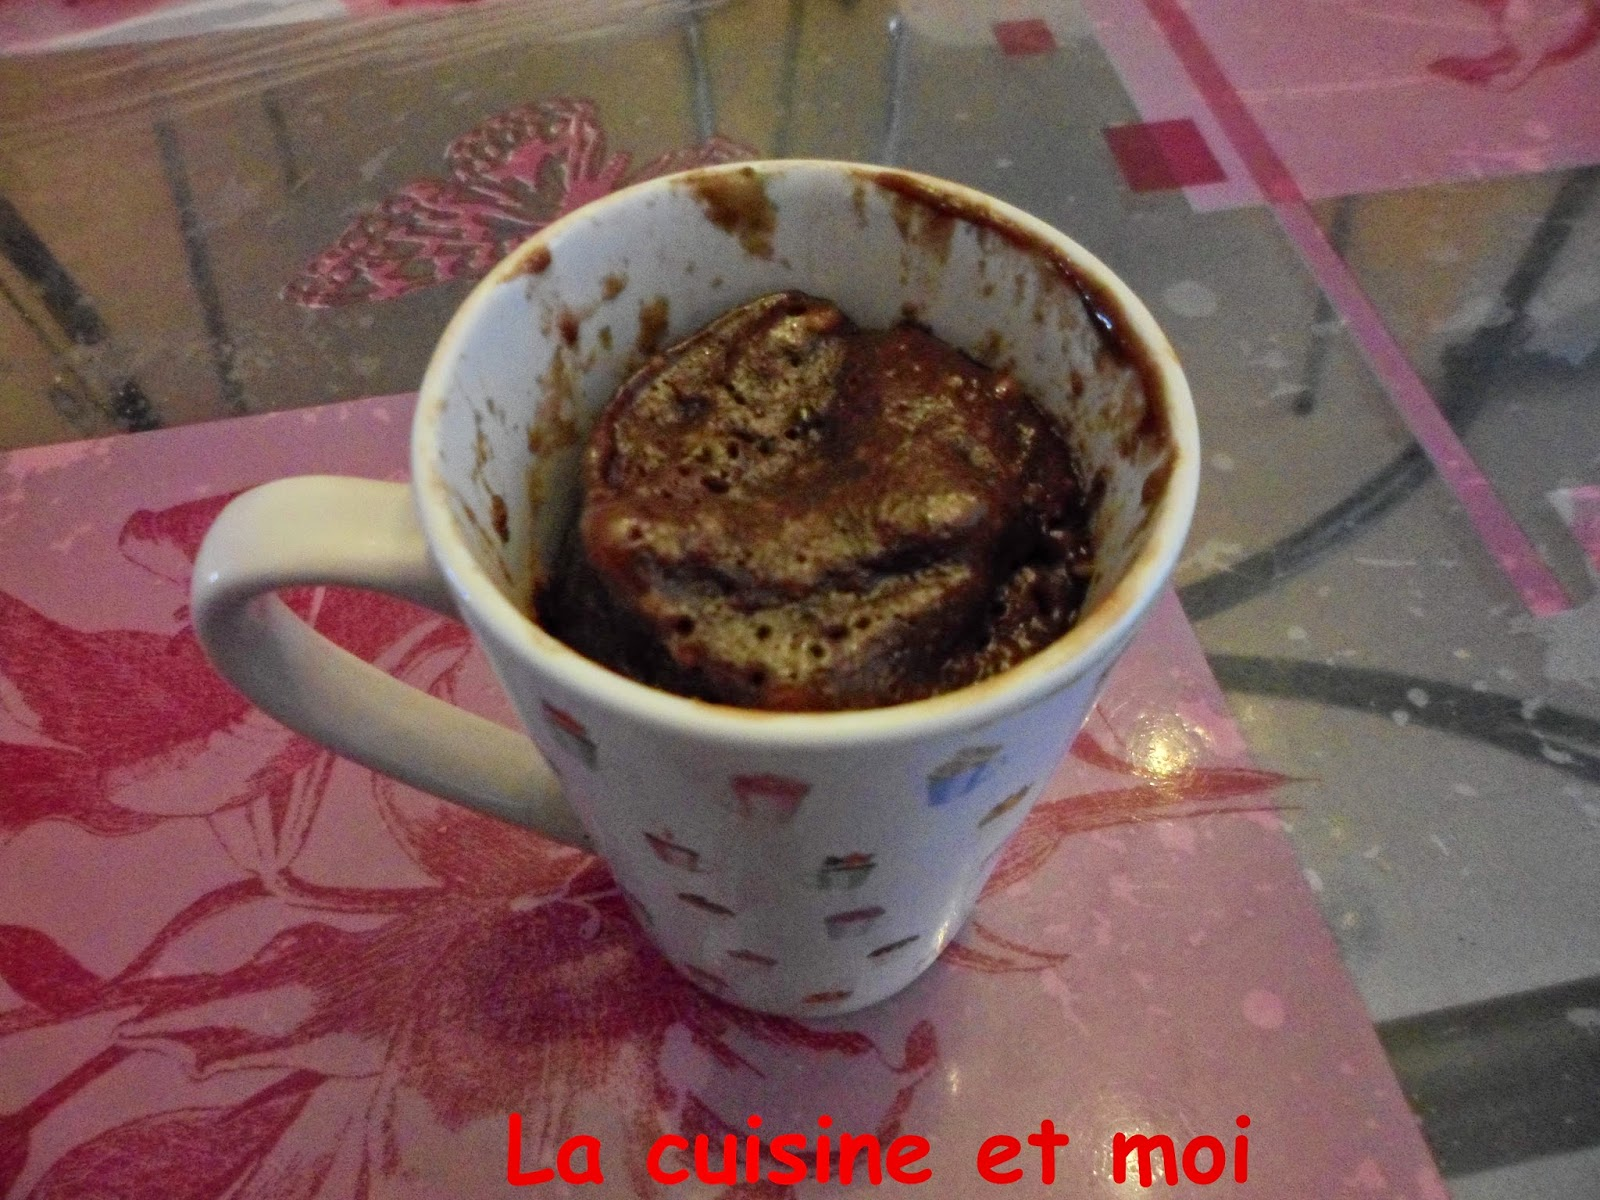 http://la-cuisine-et-moi.blogspot.fr/2014/06/mug-cake-nutella-smarties.html